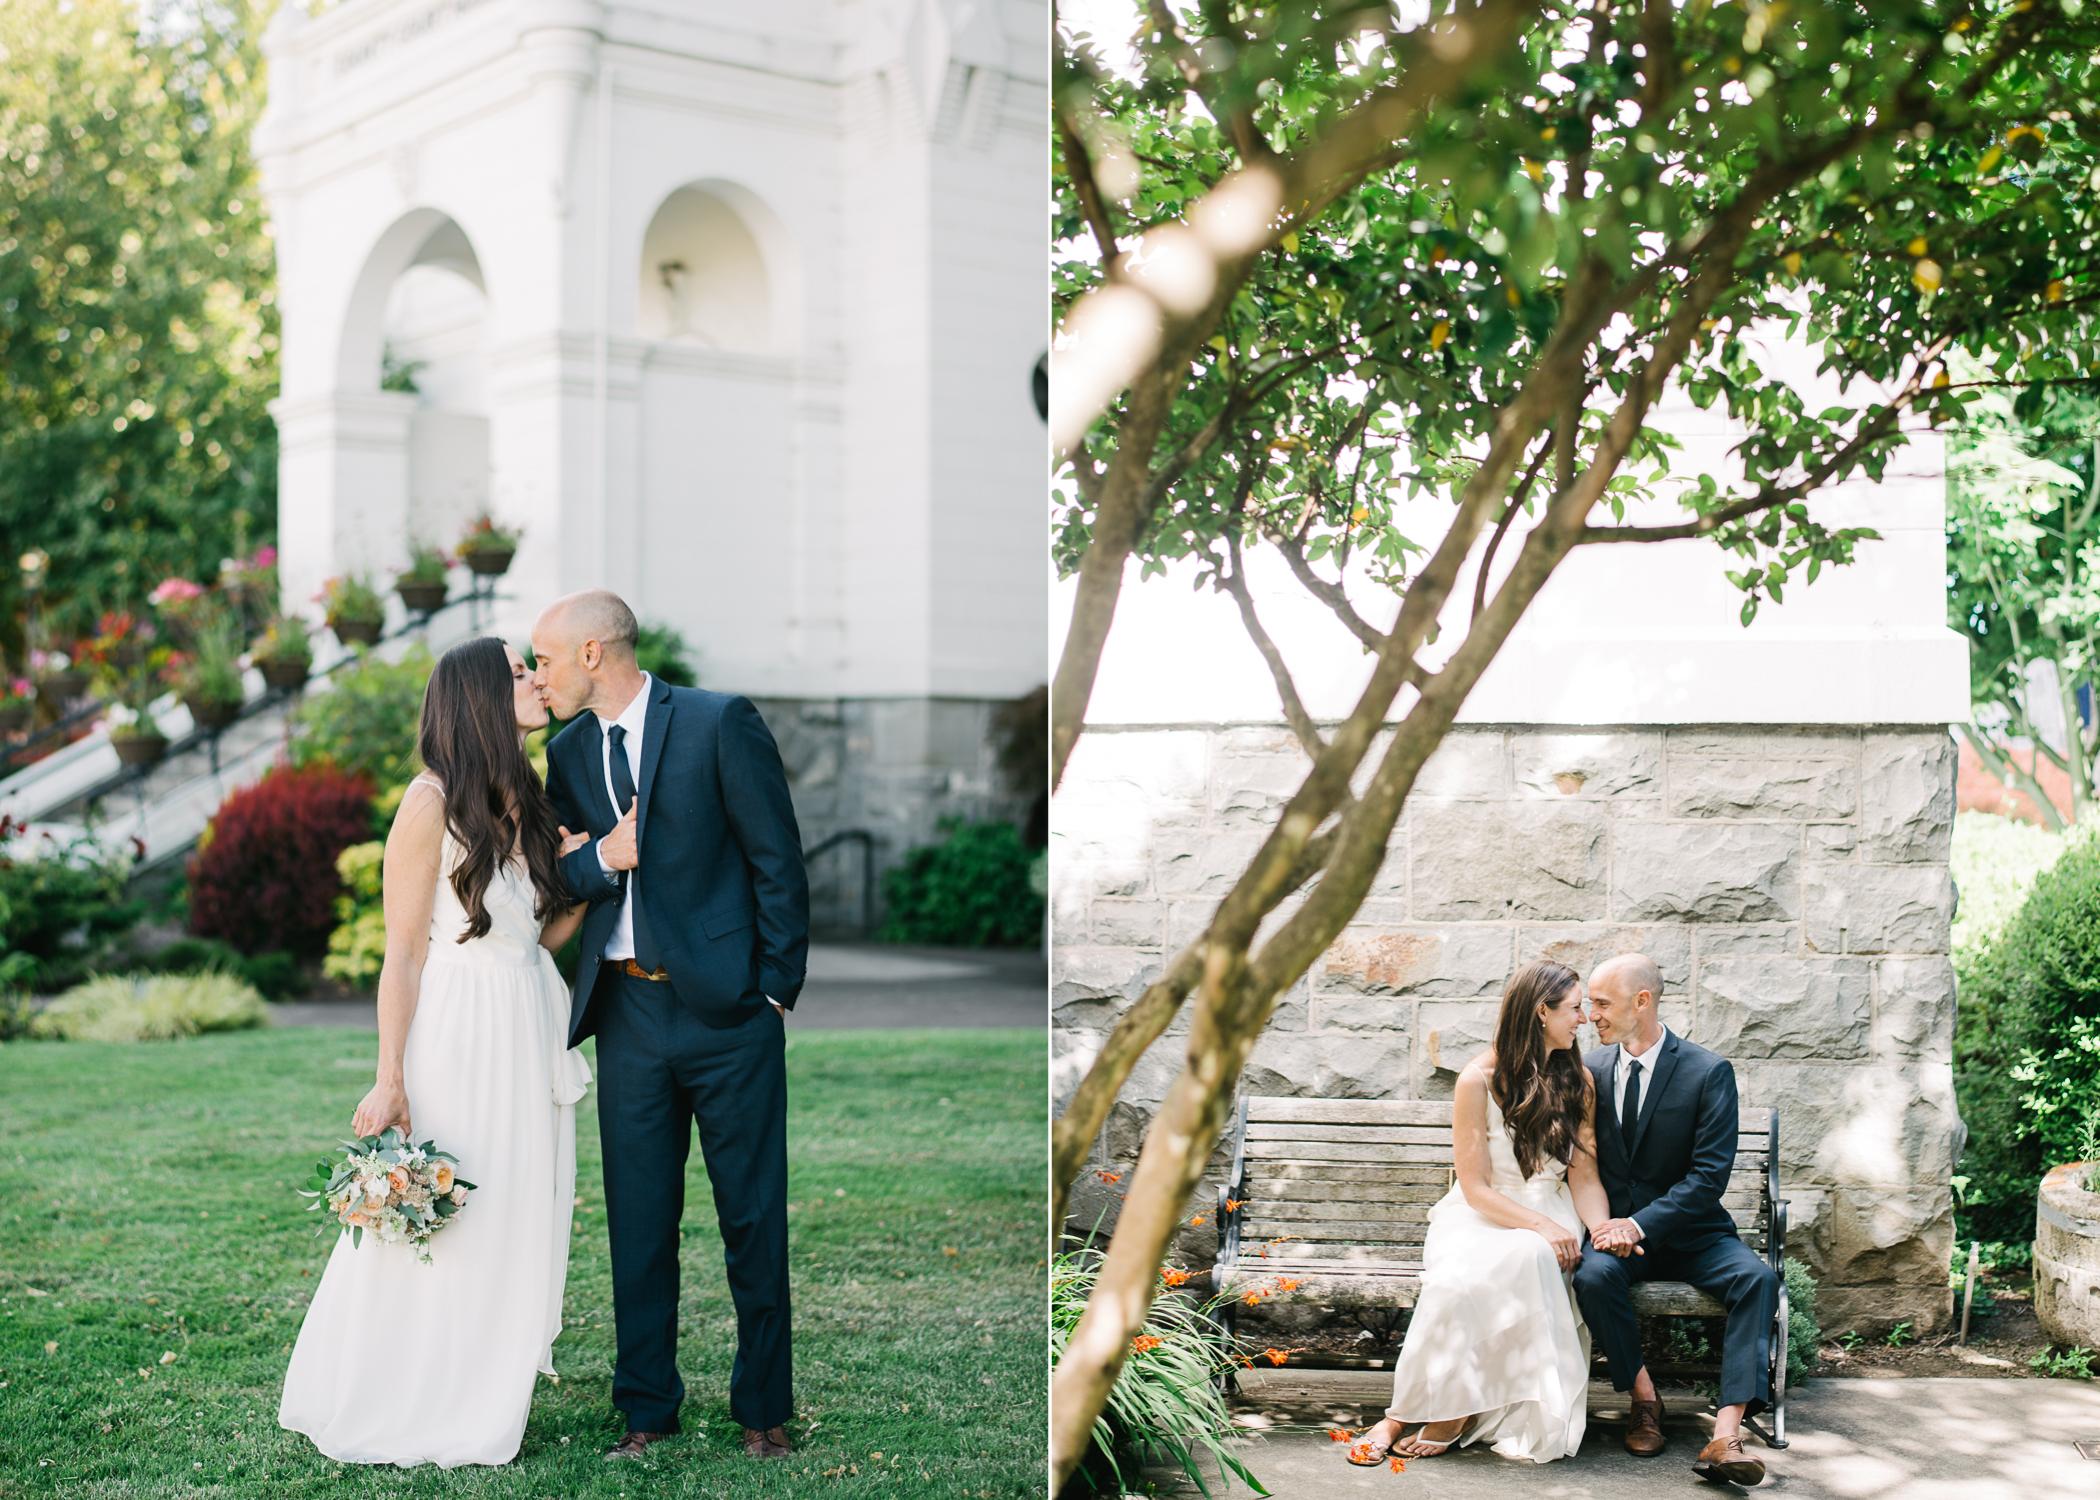 010-portland-wedding-photography-best-2018.jpg